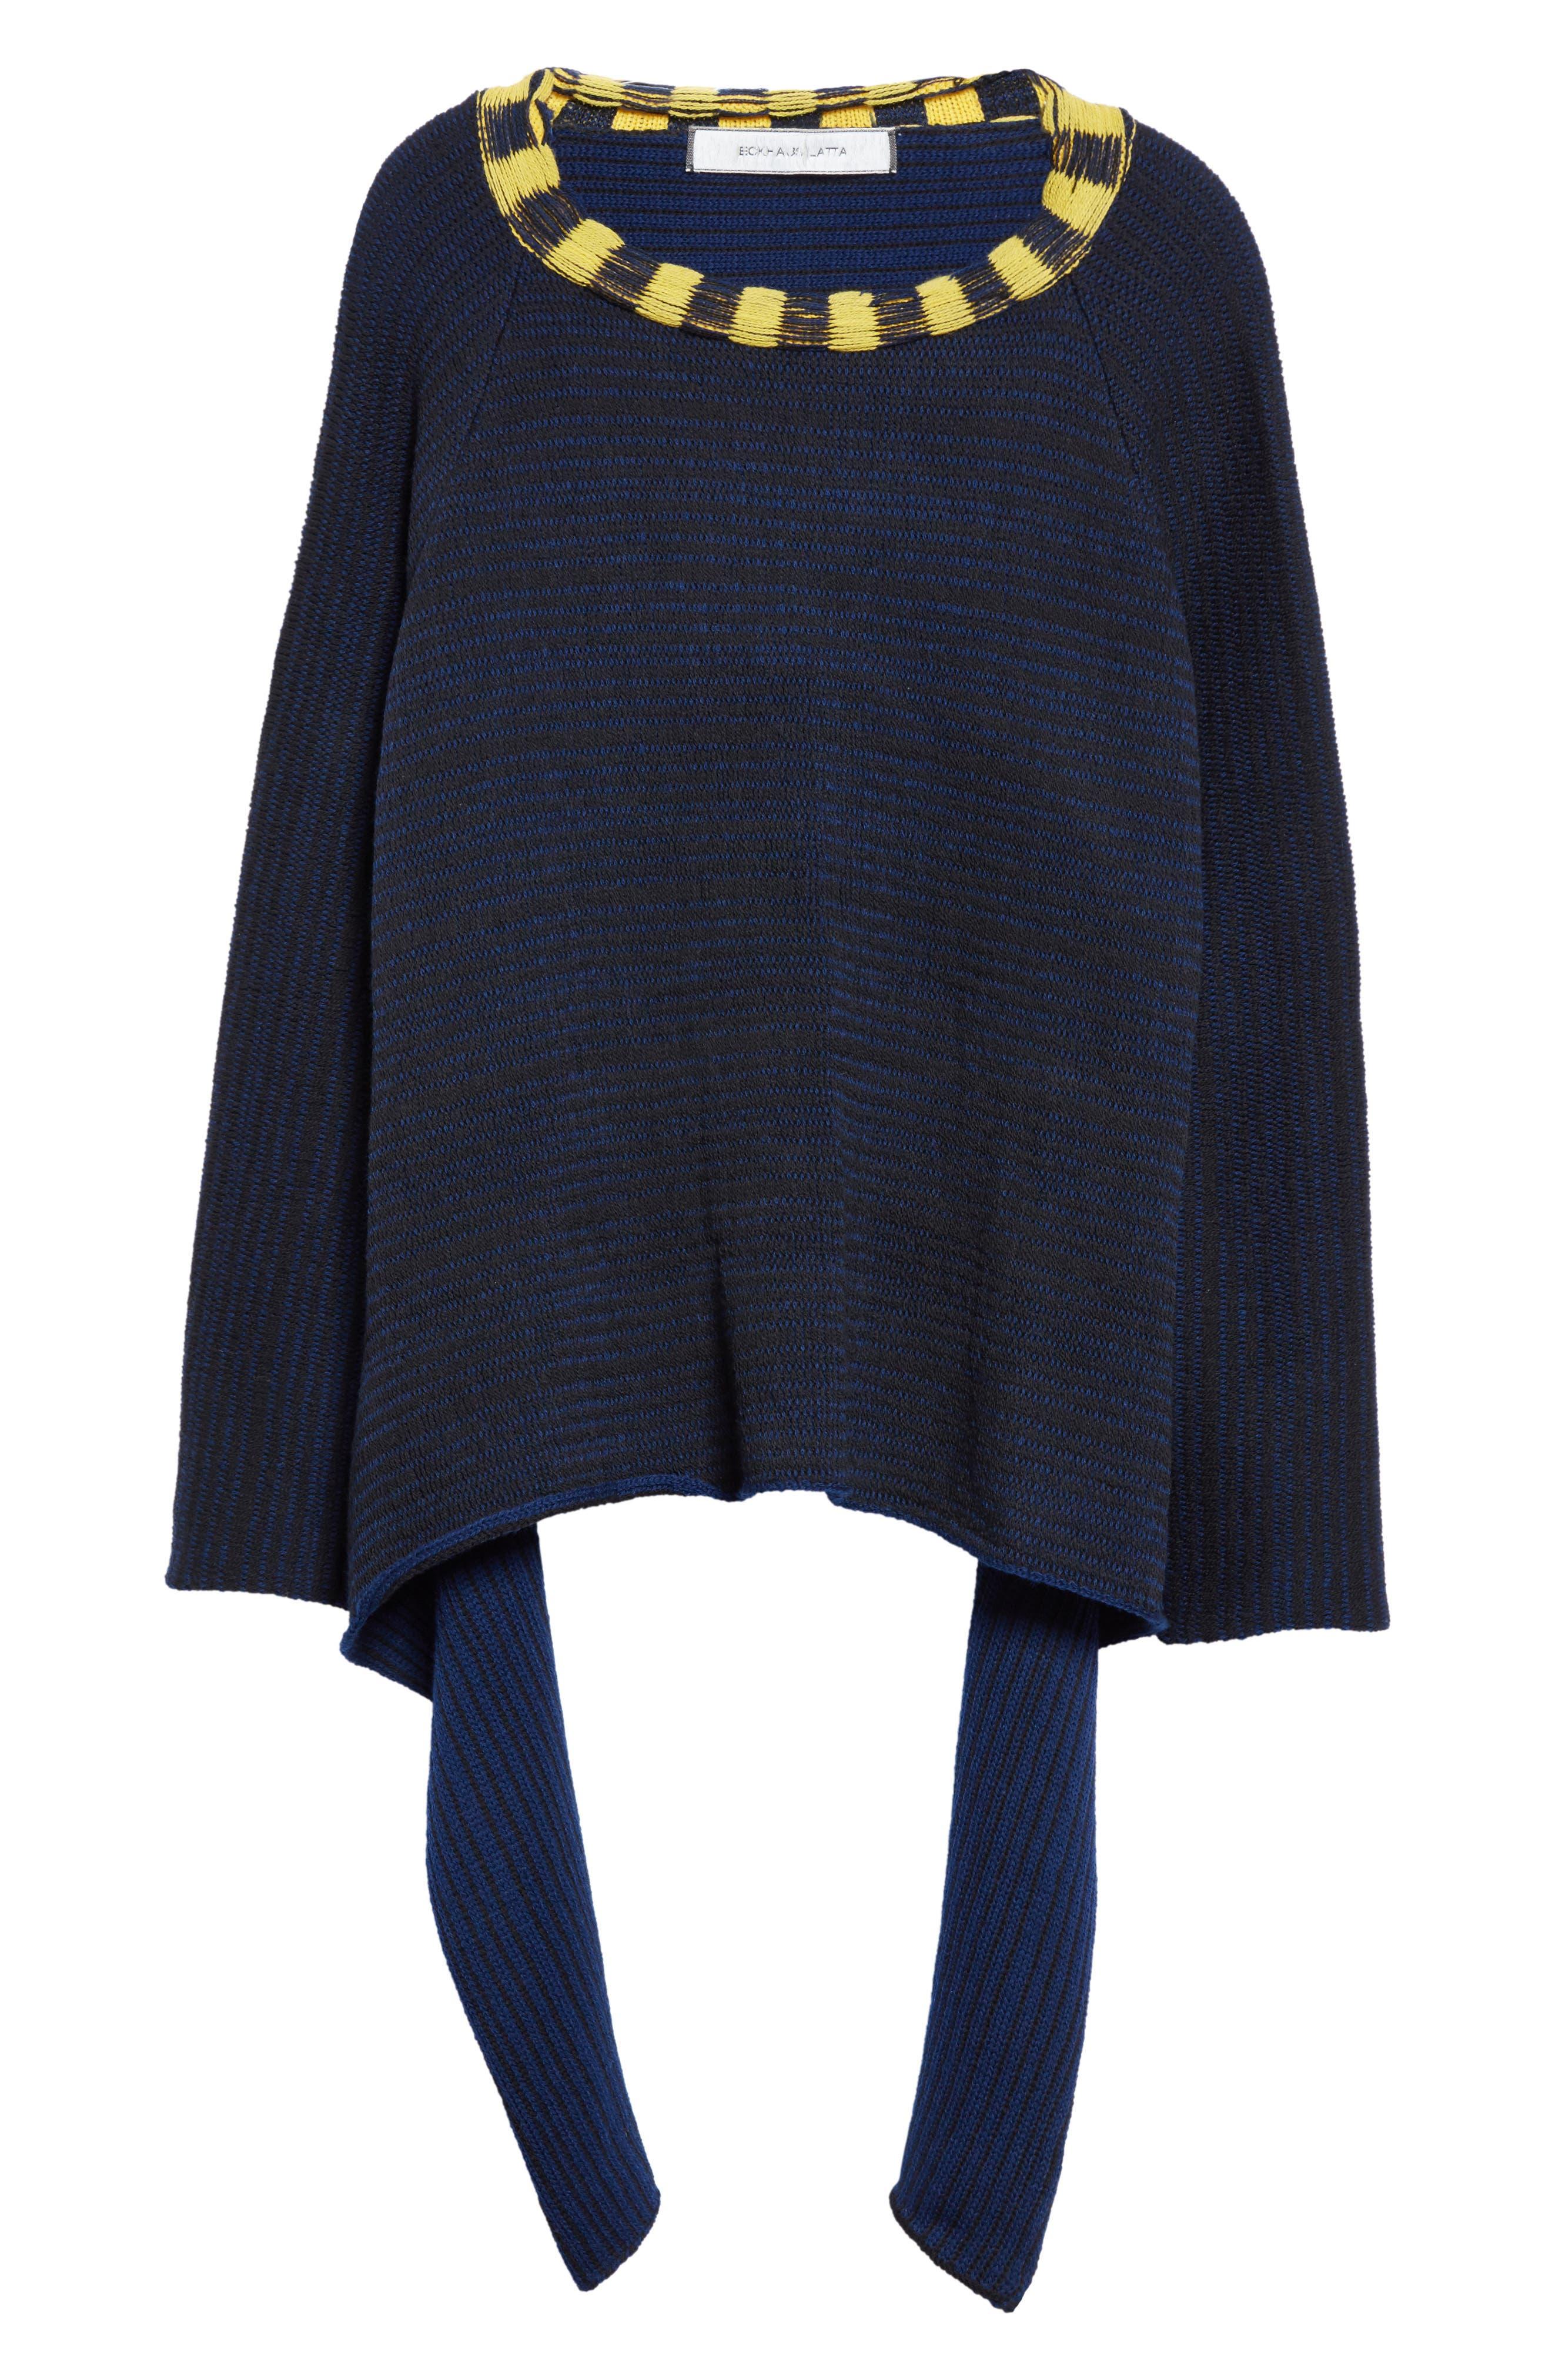 Alternate Image 4  - Eckhaus Latta Tie Back Sweater